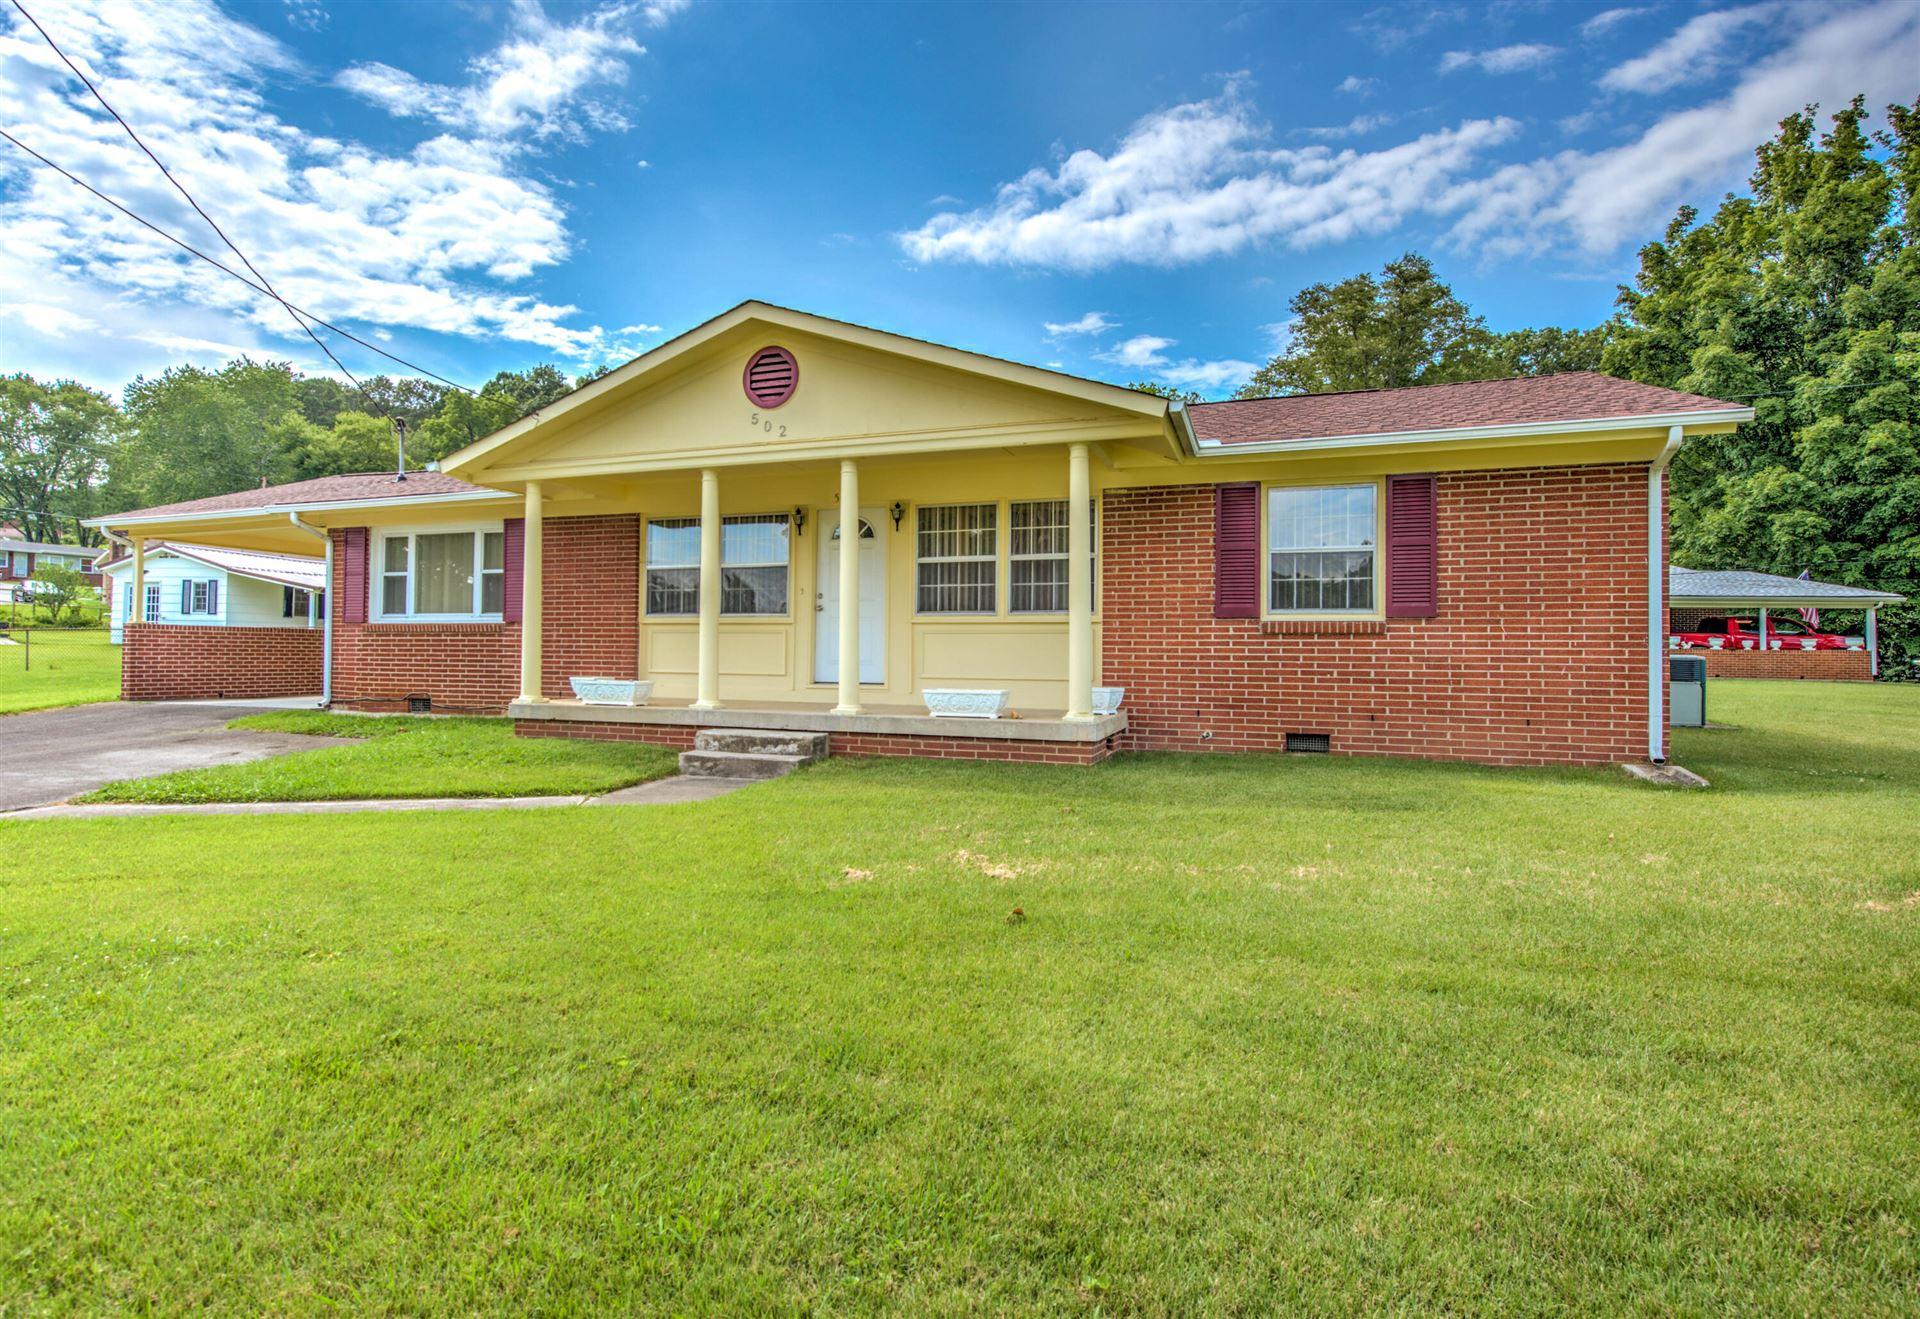 Photo of 502 Robertsville Rd, Oak Ridge, TN 37830 (MLS # 1159961)